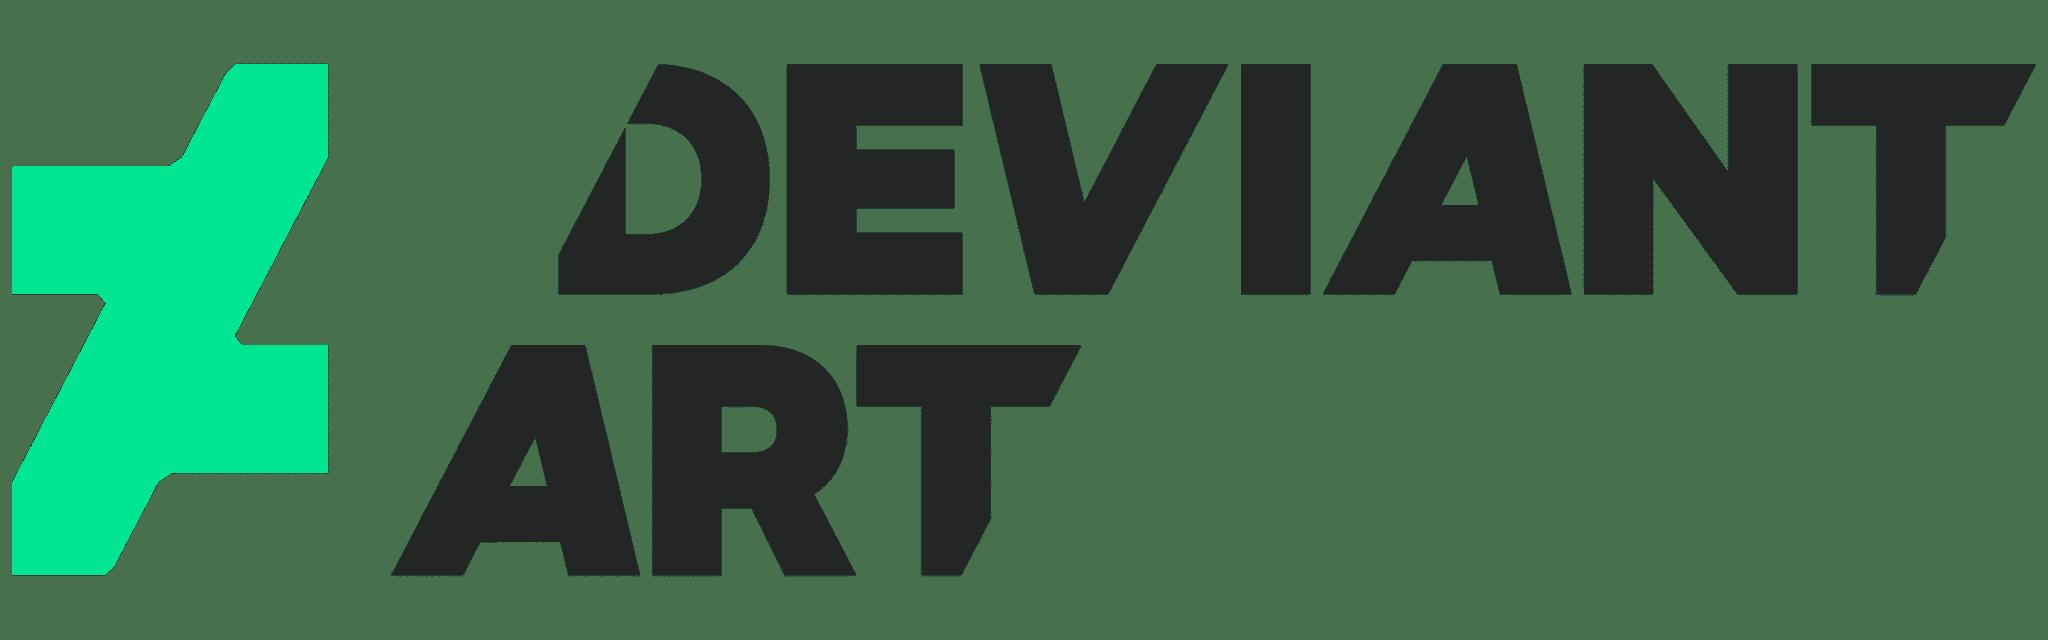 DeviantArt | Best Facebook Alternatives in 2021